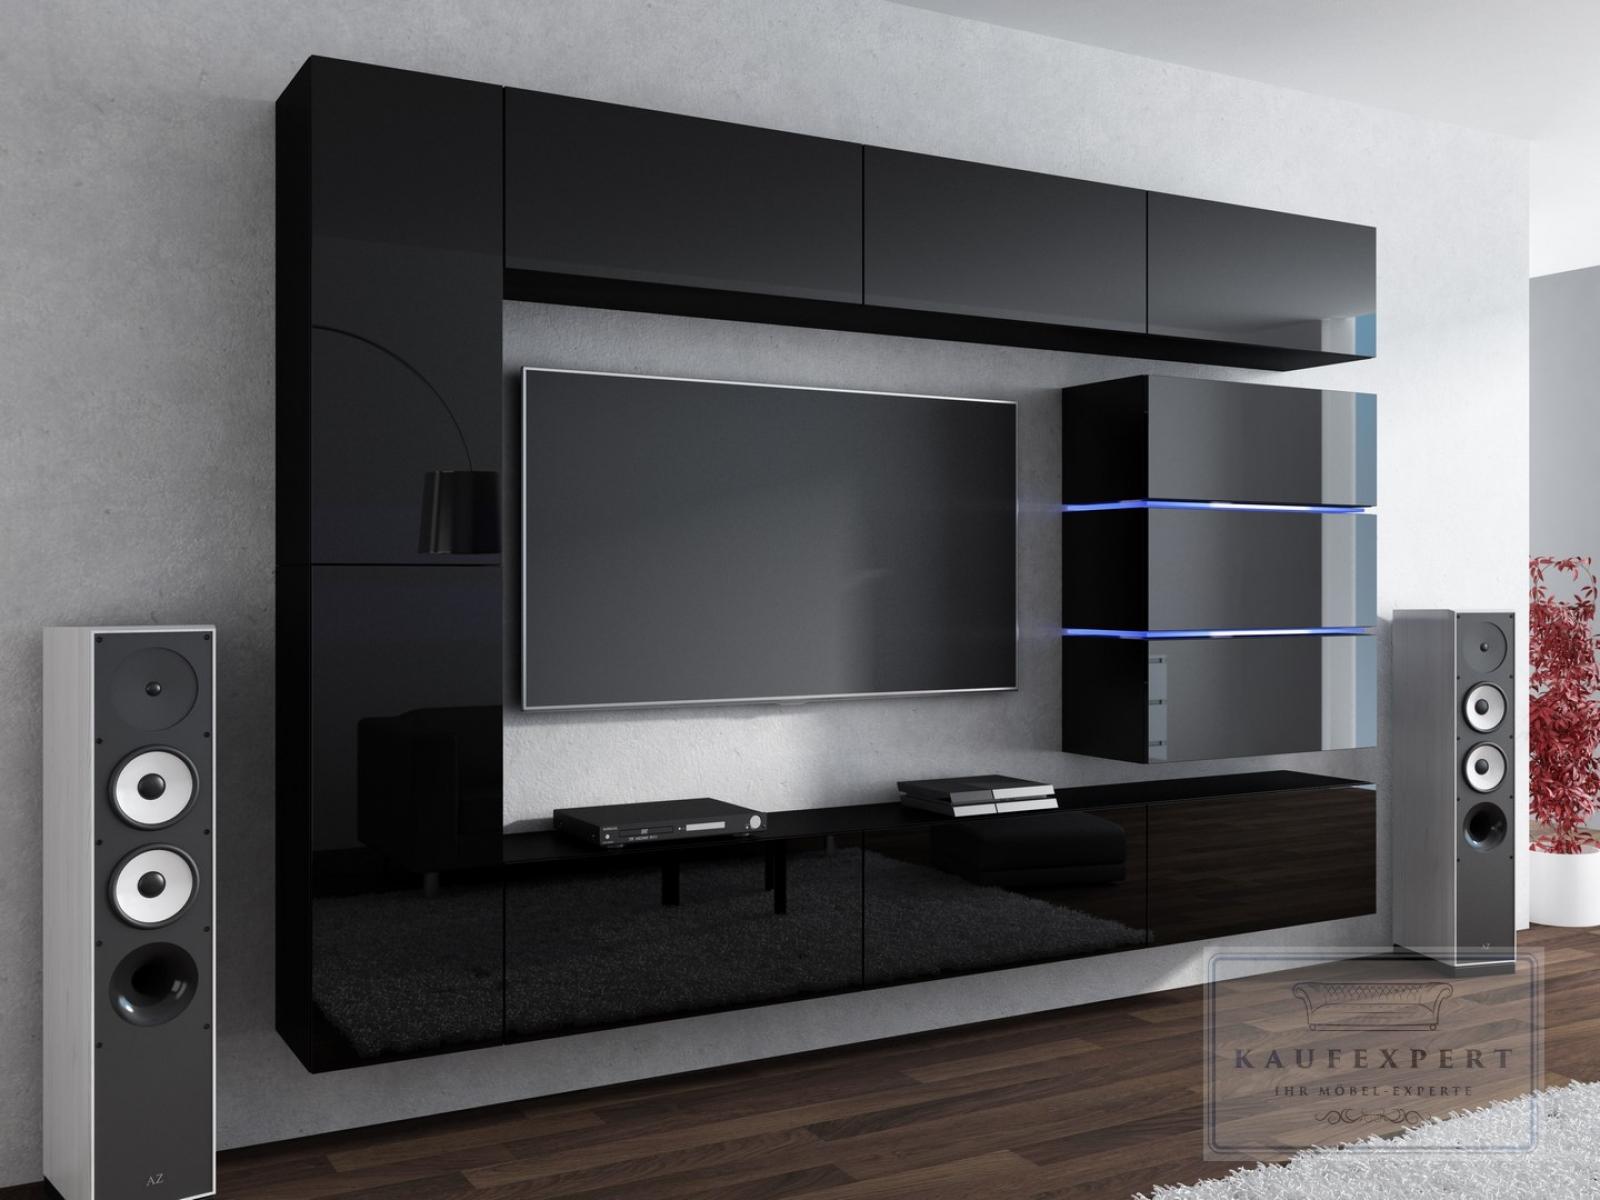 kaufexpert wohnwand shine schwarz hochglanz 284 cm mediawand medienwand design modern led. Black Bedroom Furniture Sets. Home Design Ideas